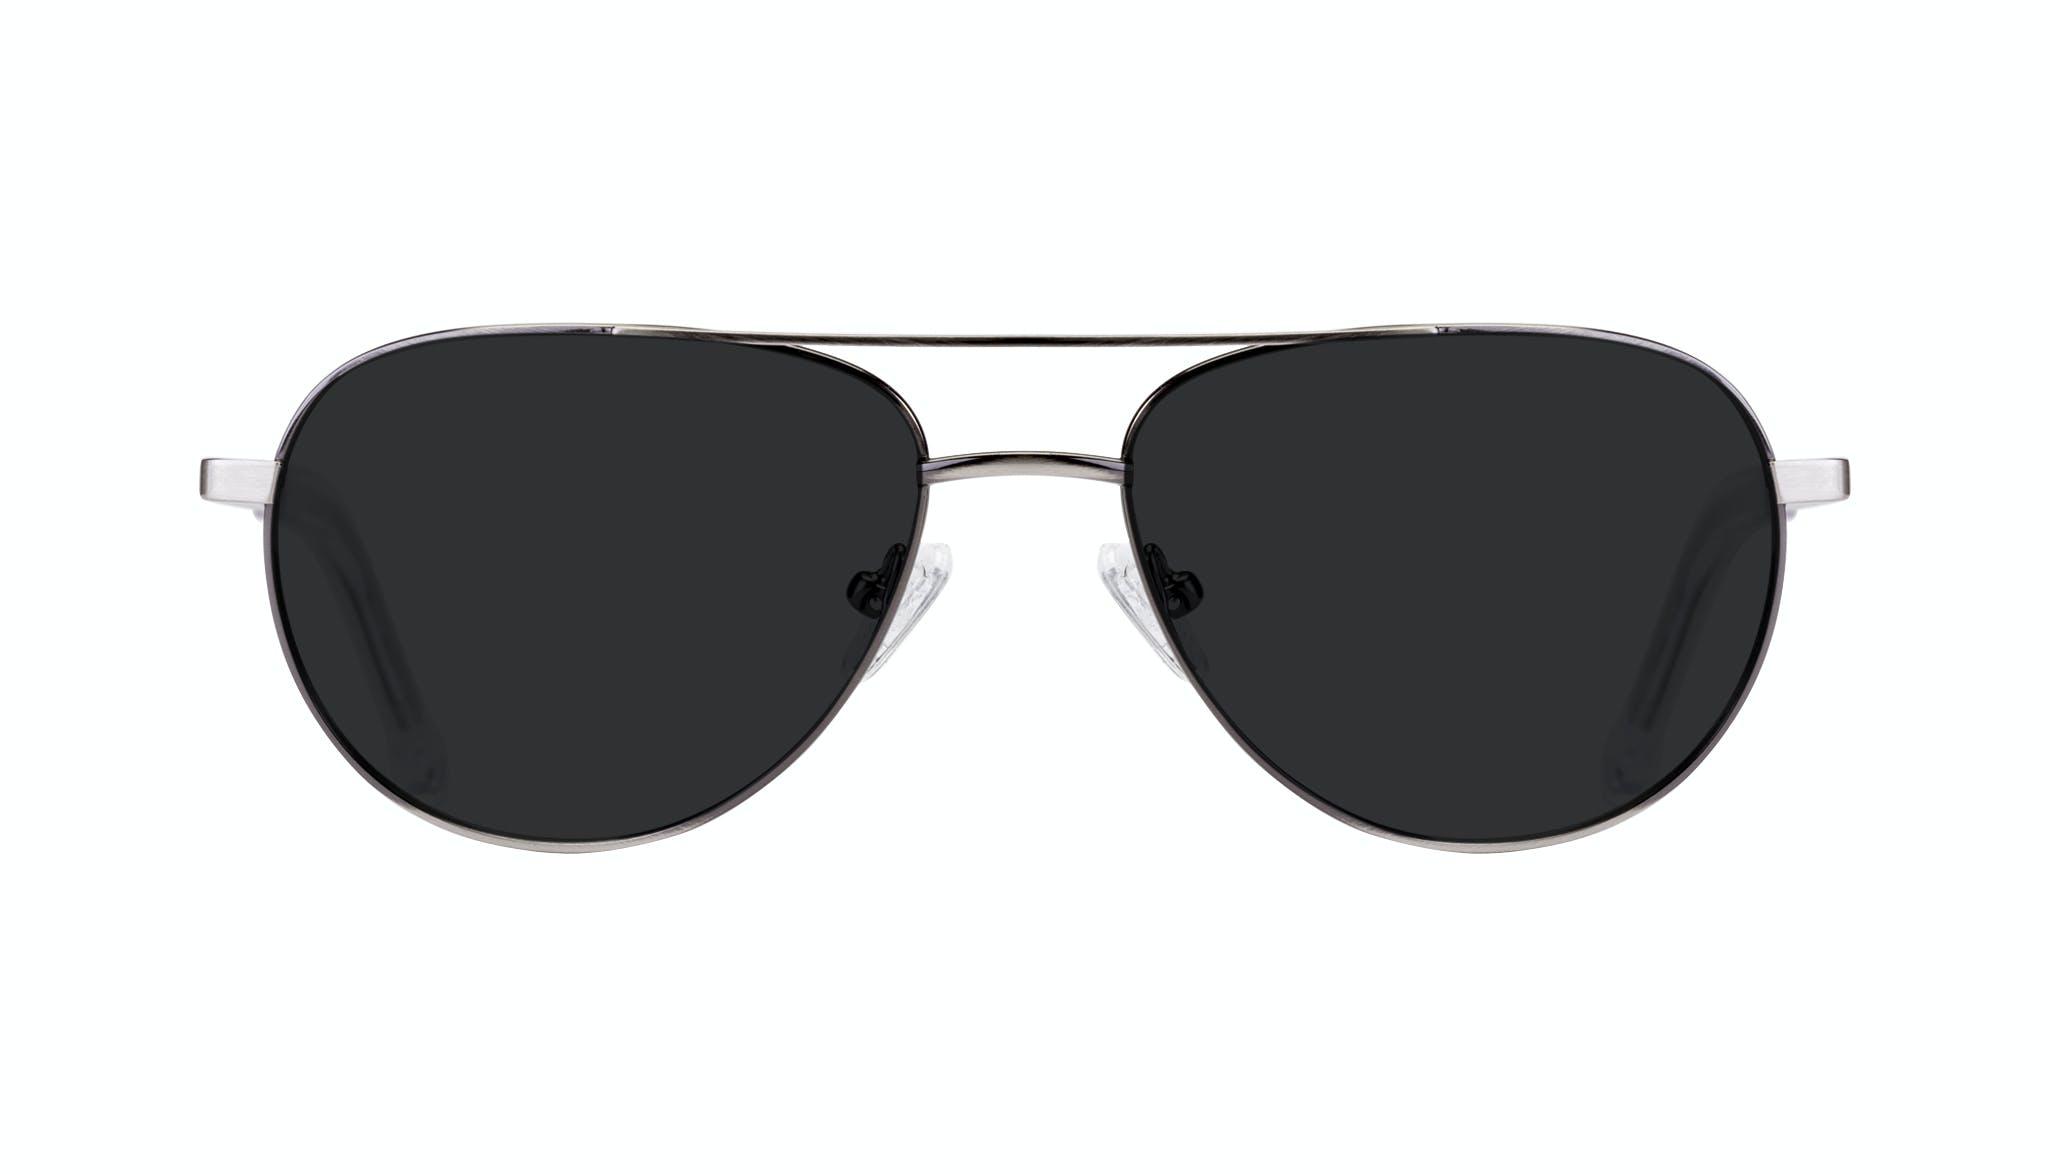 Affordable Fashion Glasses Aviator Sunglasses Men Devoted Silver Front